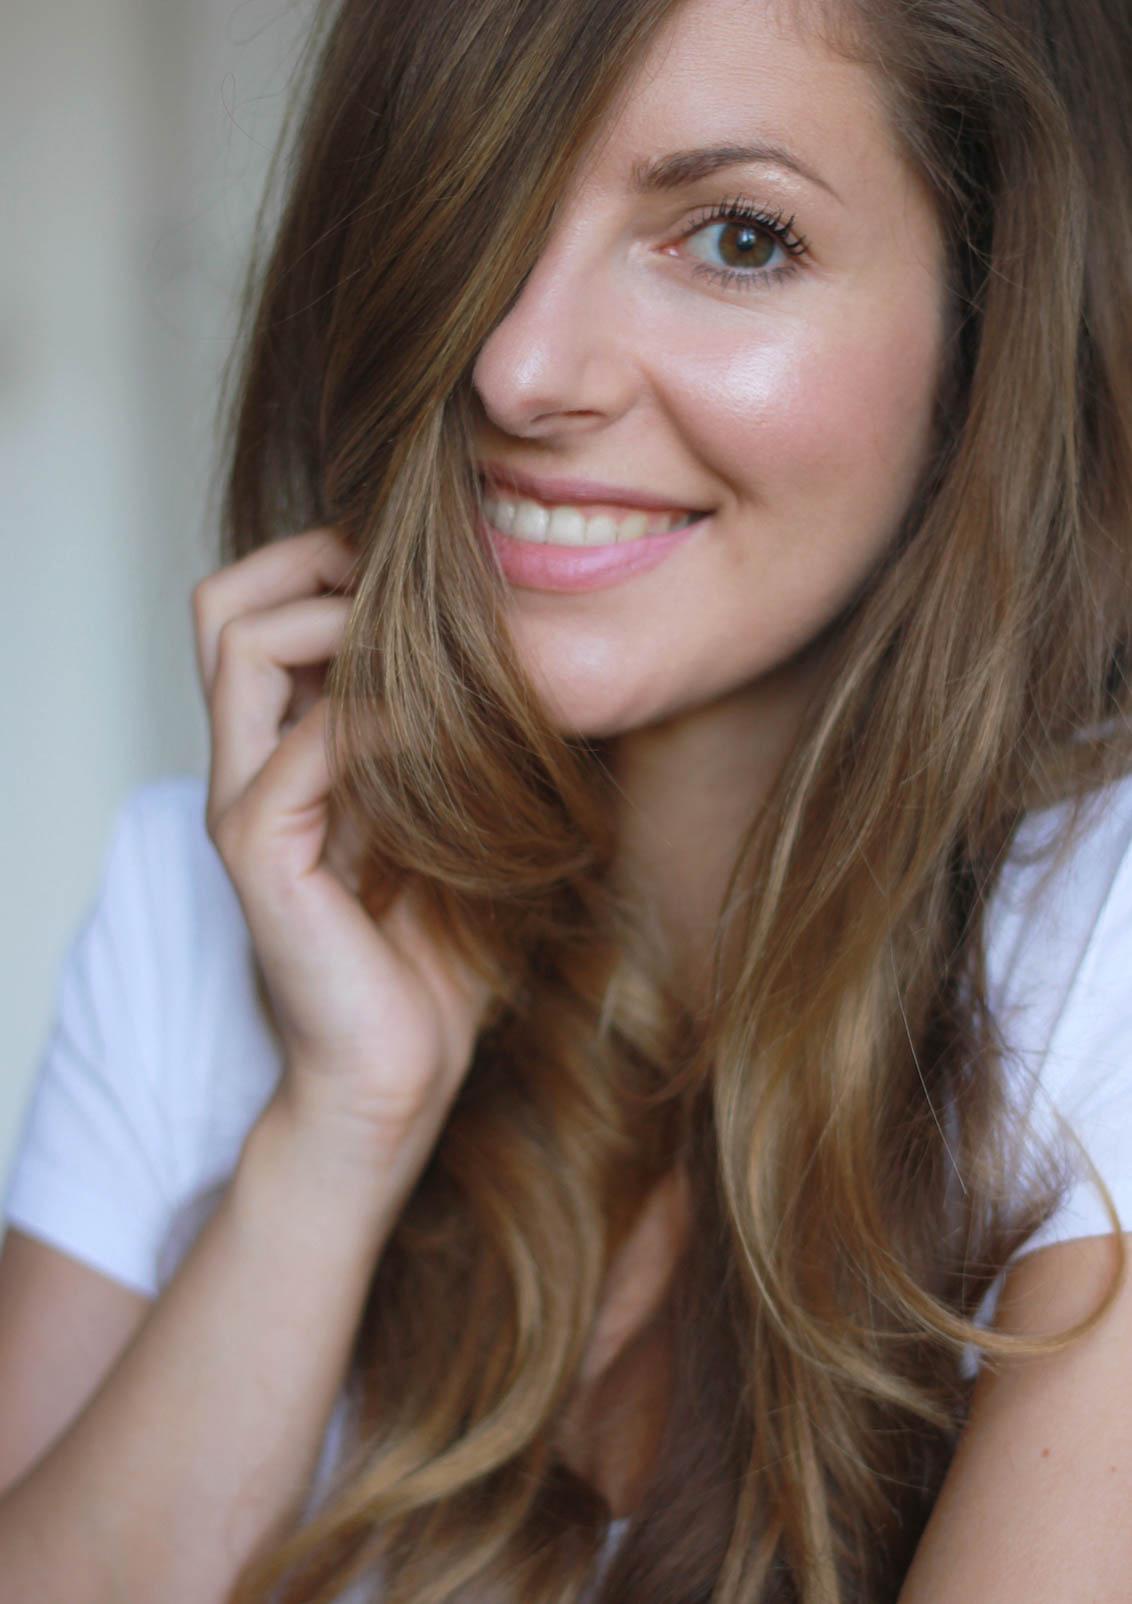 beautyressort-glowing skin